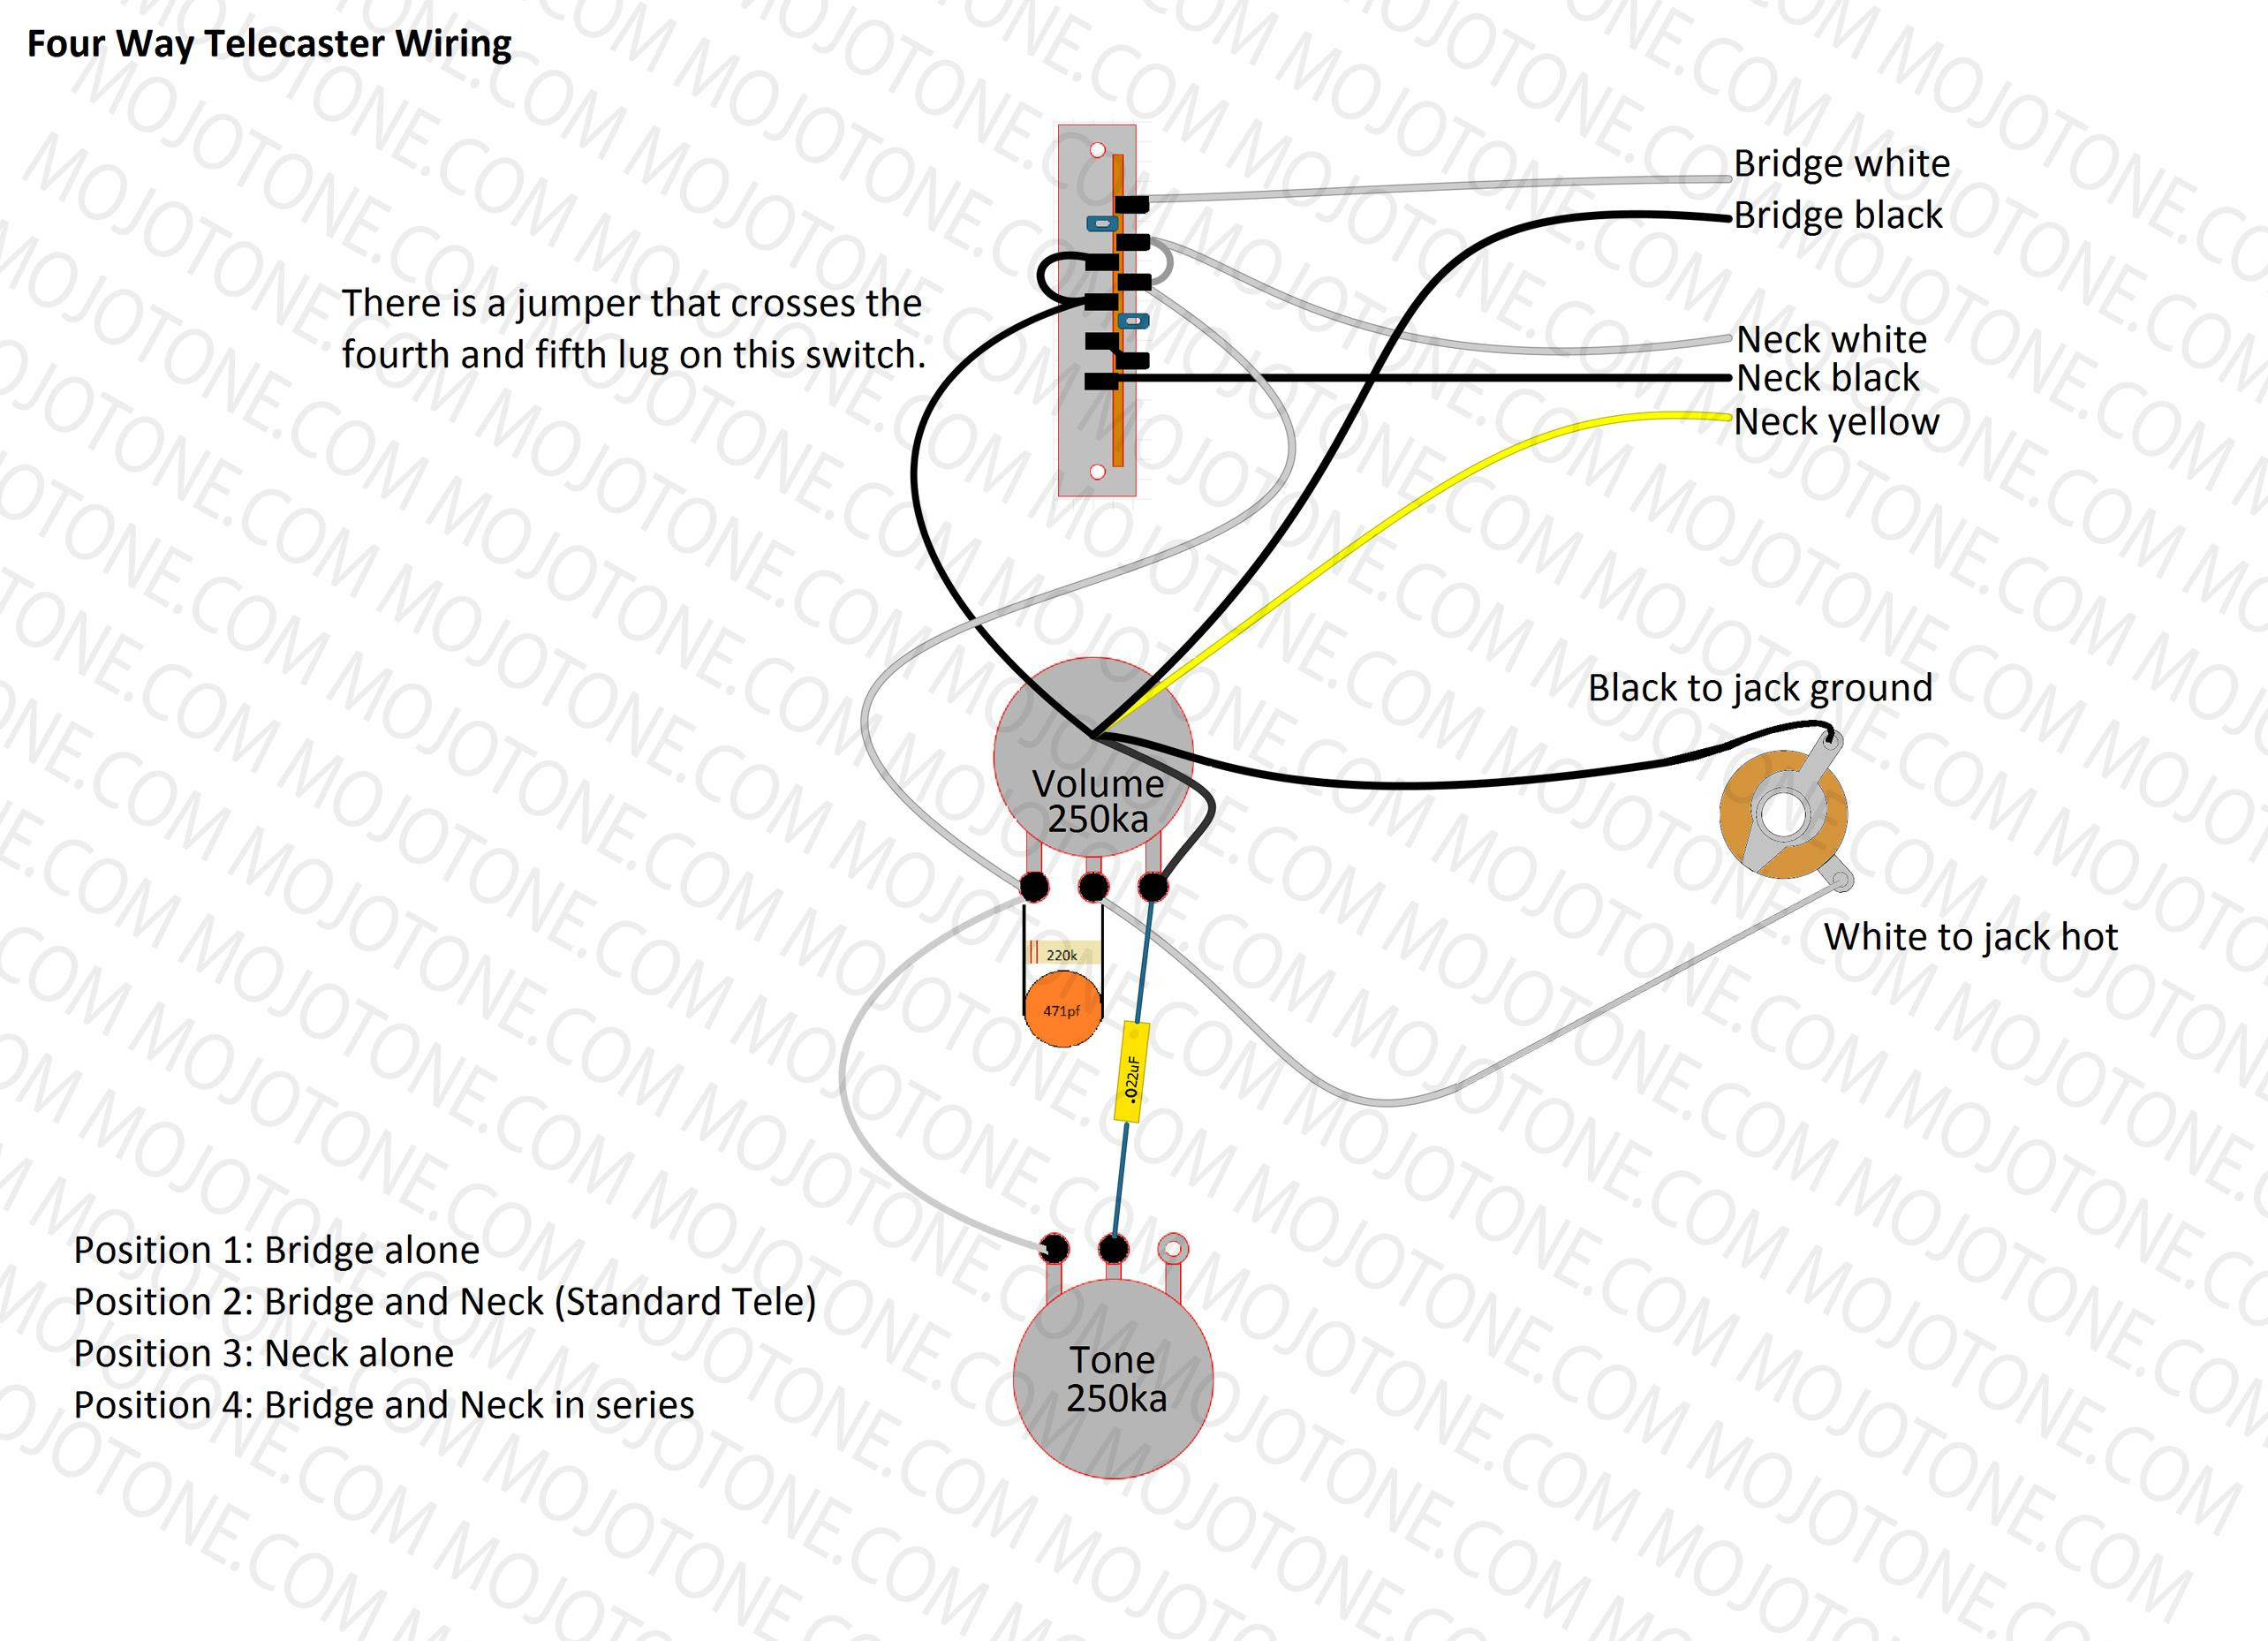 Standard Fender Telecaster Wiring Diagram from lh5.googleusercontent.com